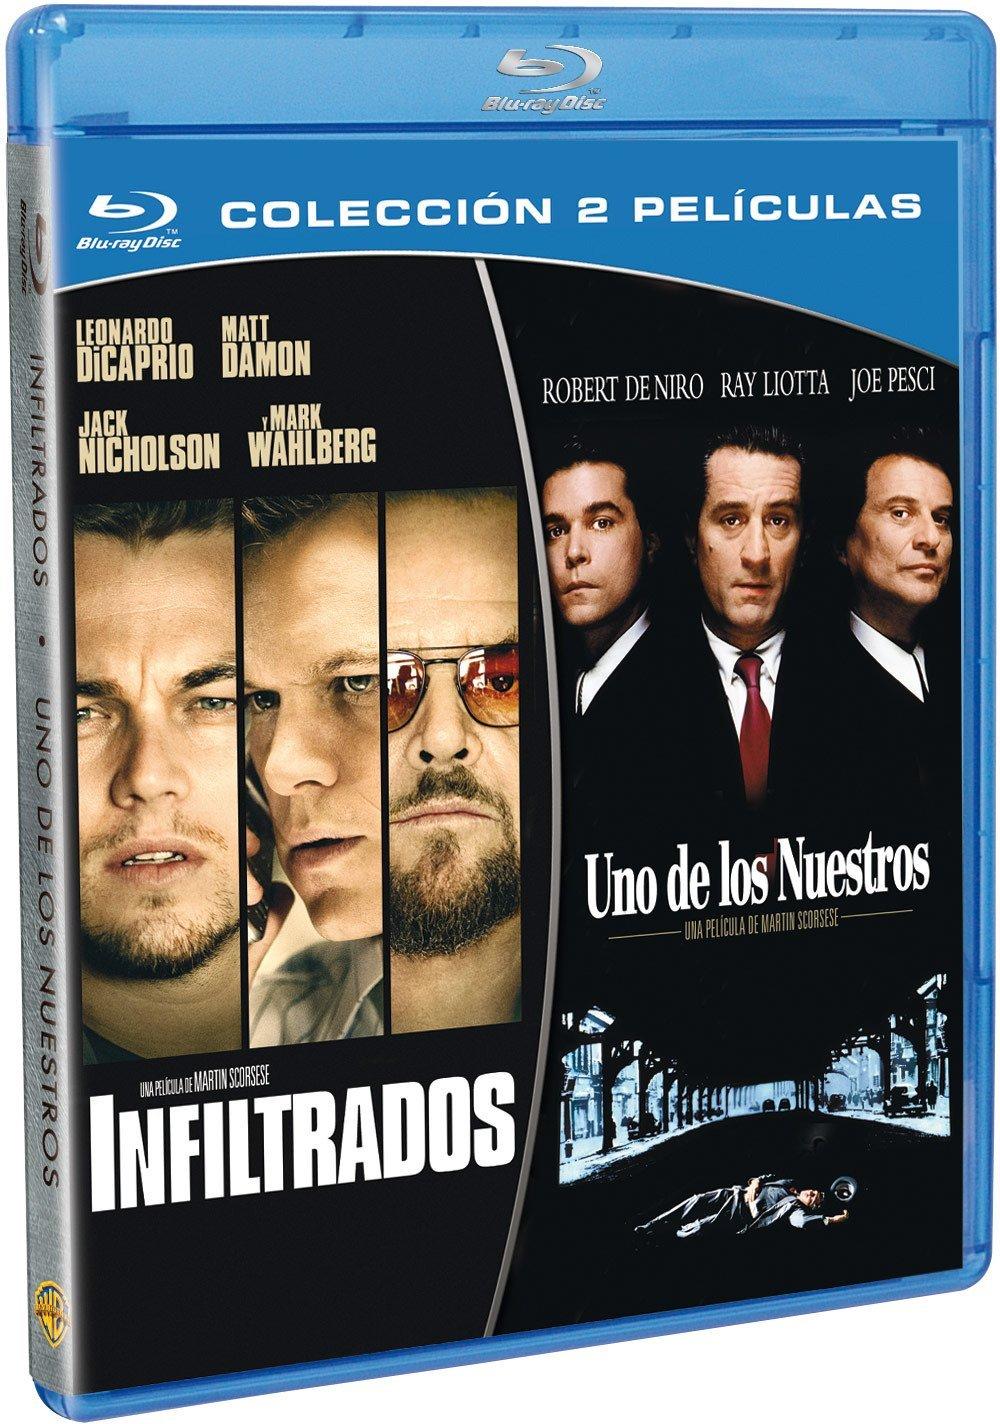 Pack: Infiltrados + Uno De Los Nuestros [Blu-ray]: Amazon.es: Leonardo DiCaprio, Matt Damon, Robert De Niro, Ray Liotta, Martin Scorsese, Leonardo DiCaprio, Matt Damon, Brad Grey, Irwin Winkler: Cine y Series TV